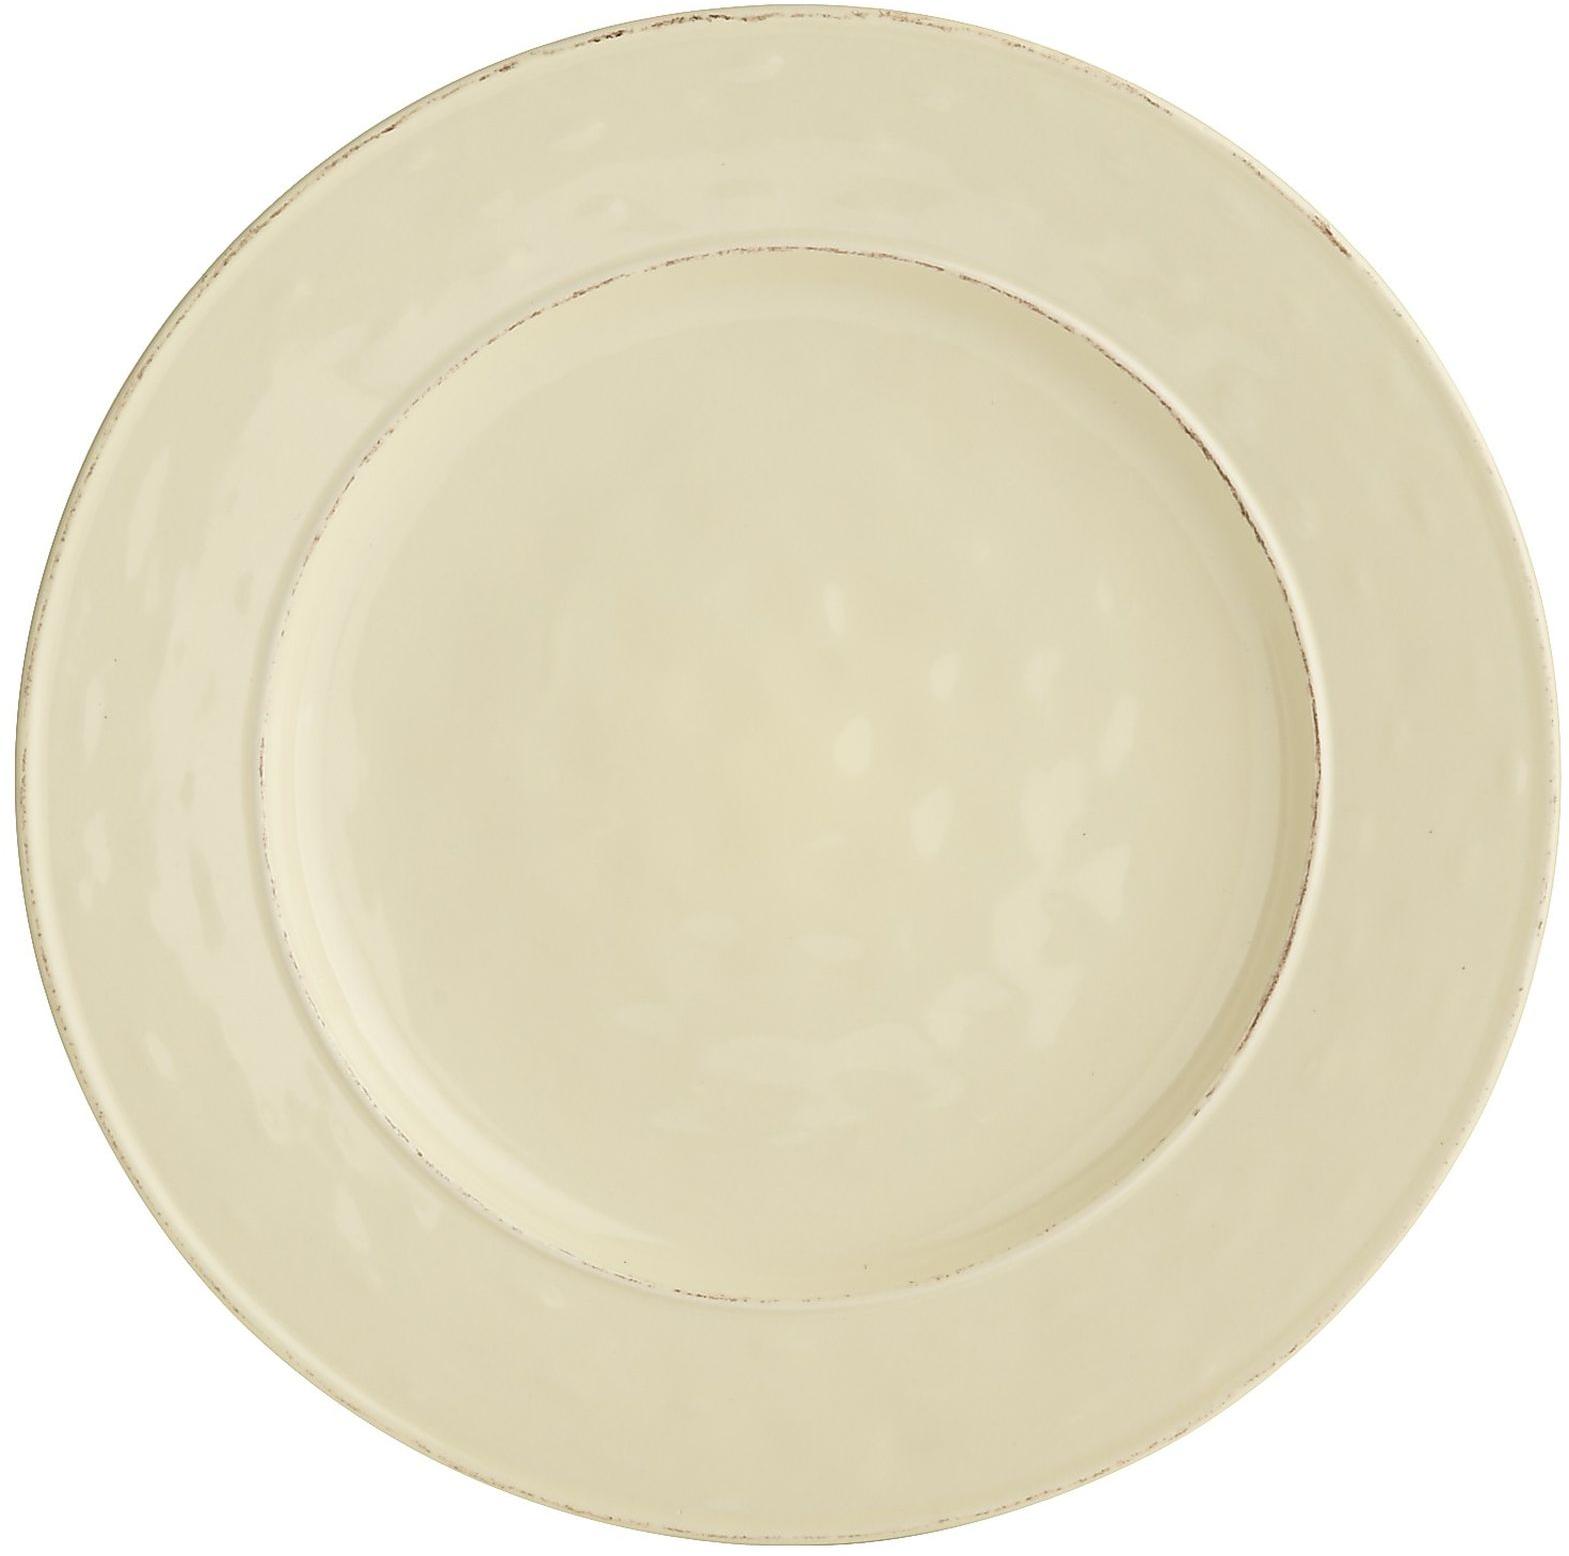 Martillo Dinner Plate - Cream | Pier 1 Imports